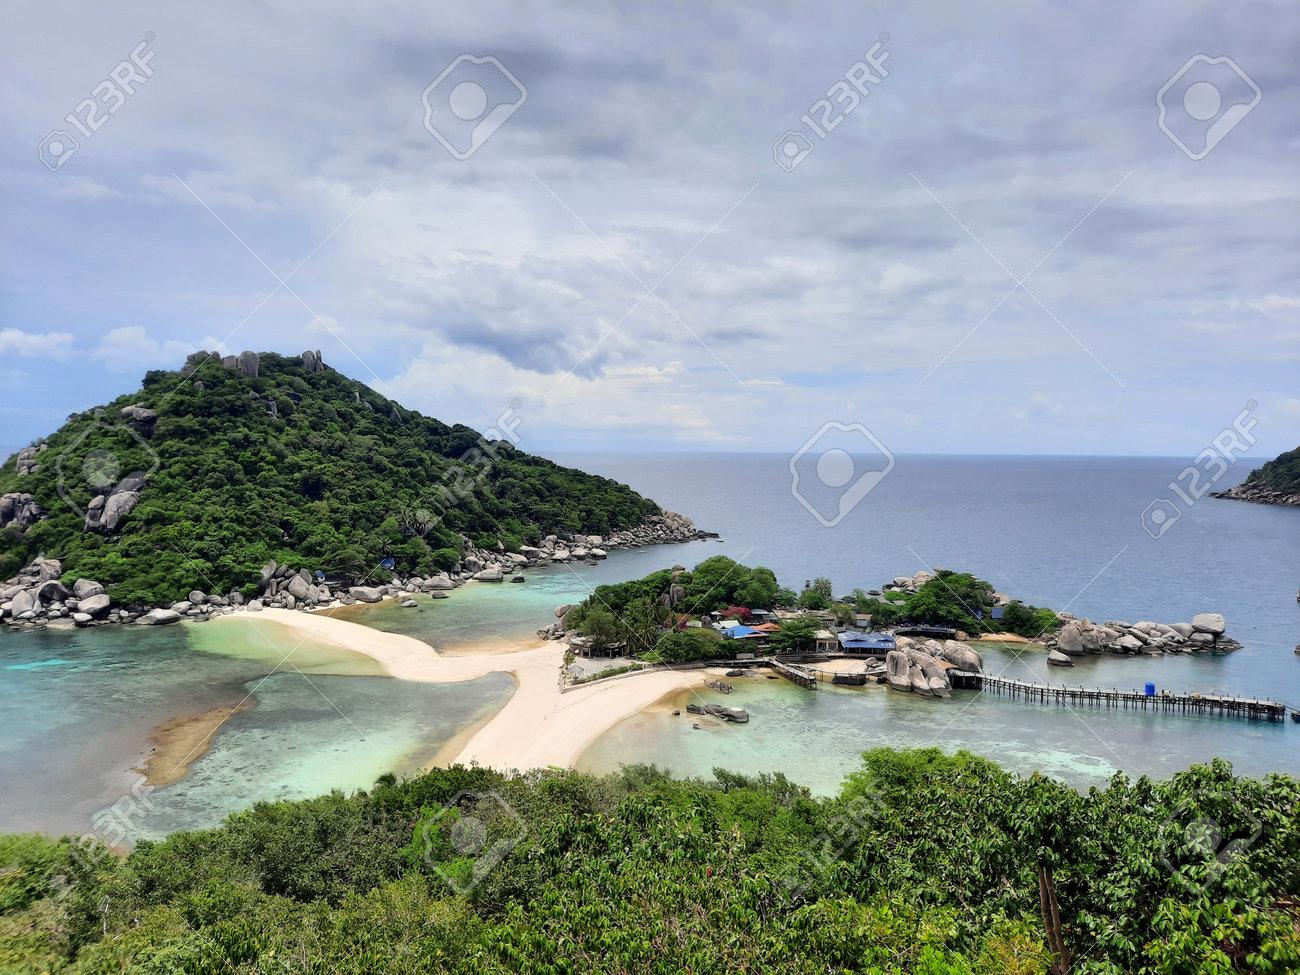 at the most famous viewpoint named Koh Nang Yuan Viewpoint on the tropical small island named Nangyuan Island Beach in Thailand next to the island named Koh Tao at midday, May 3, 2021 - 169664550